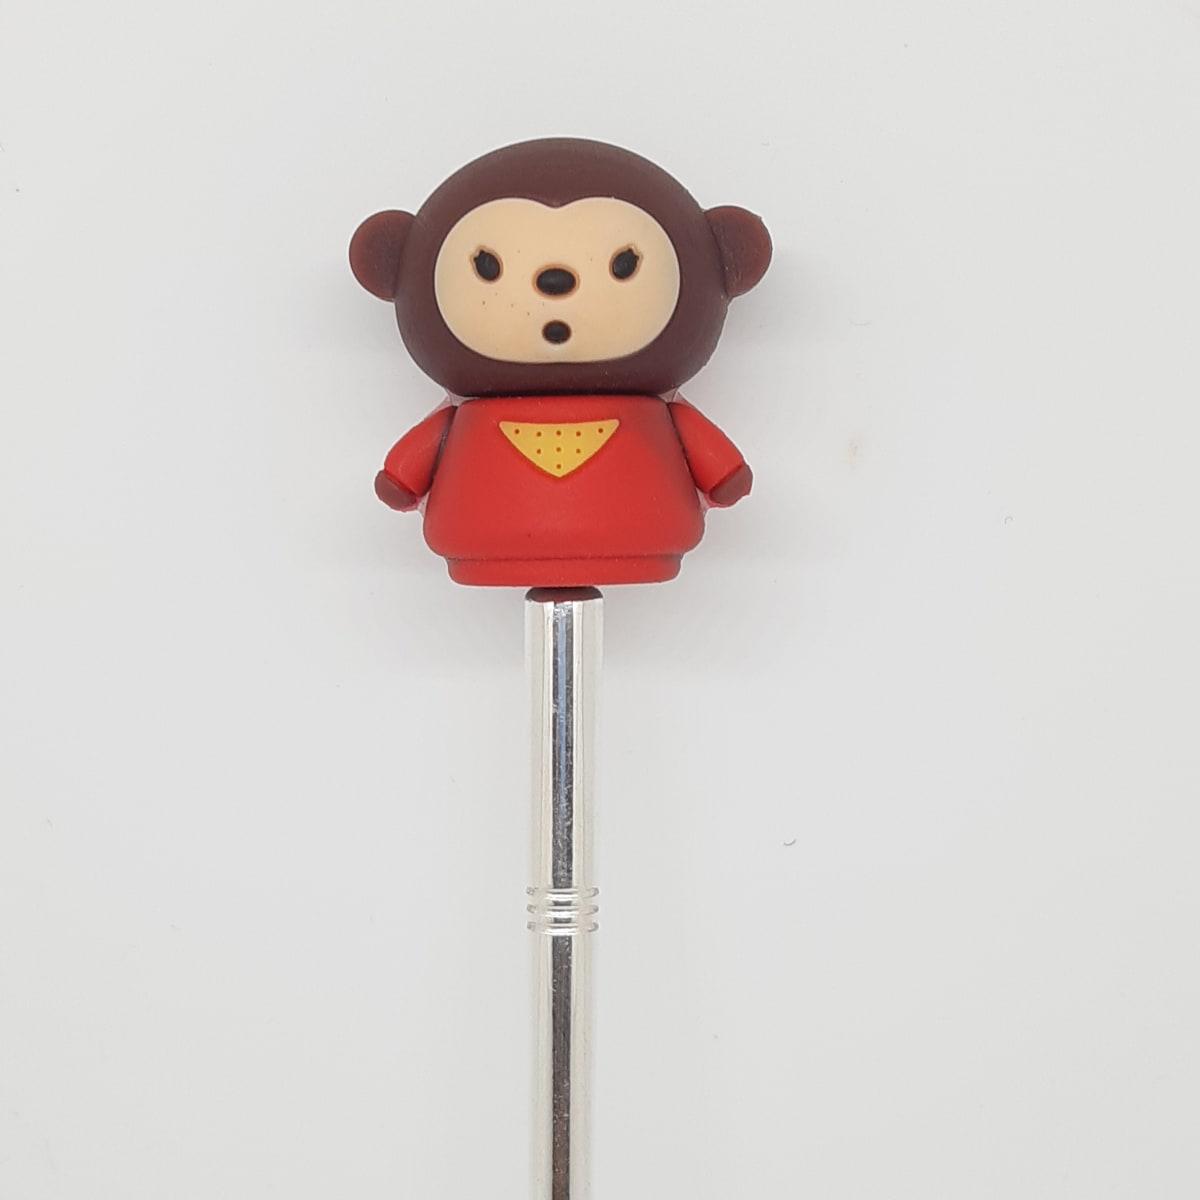 Teddy Spoon